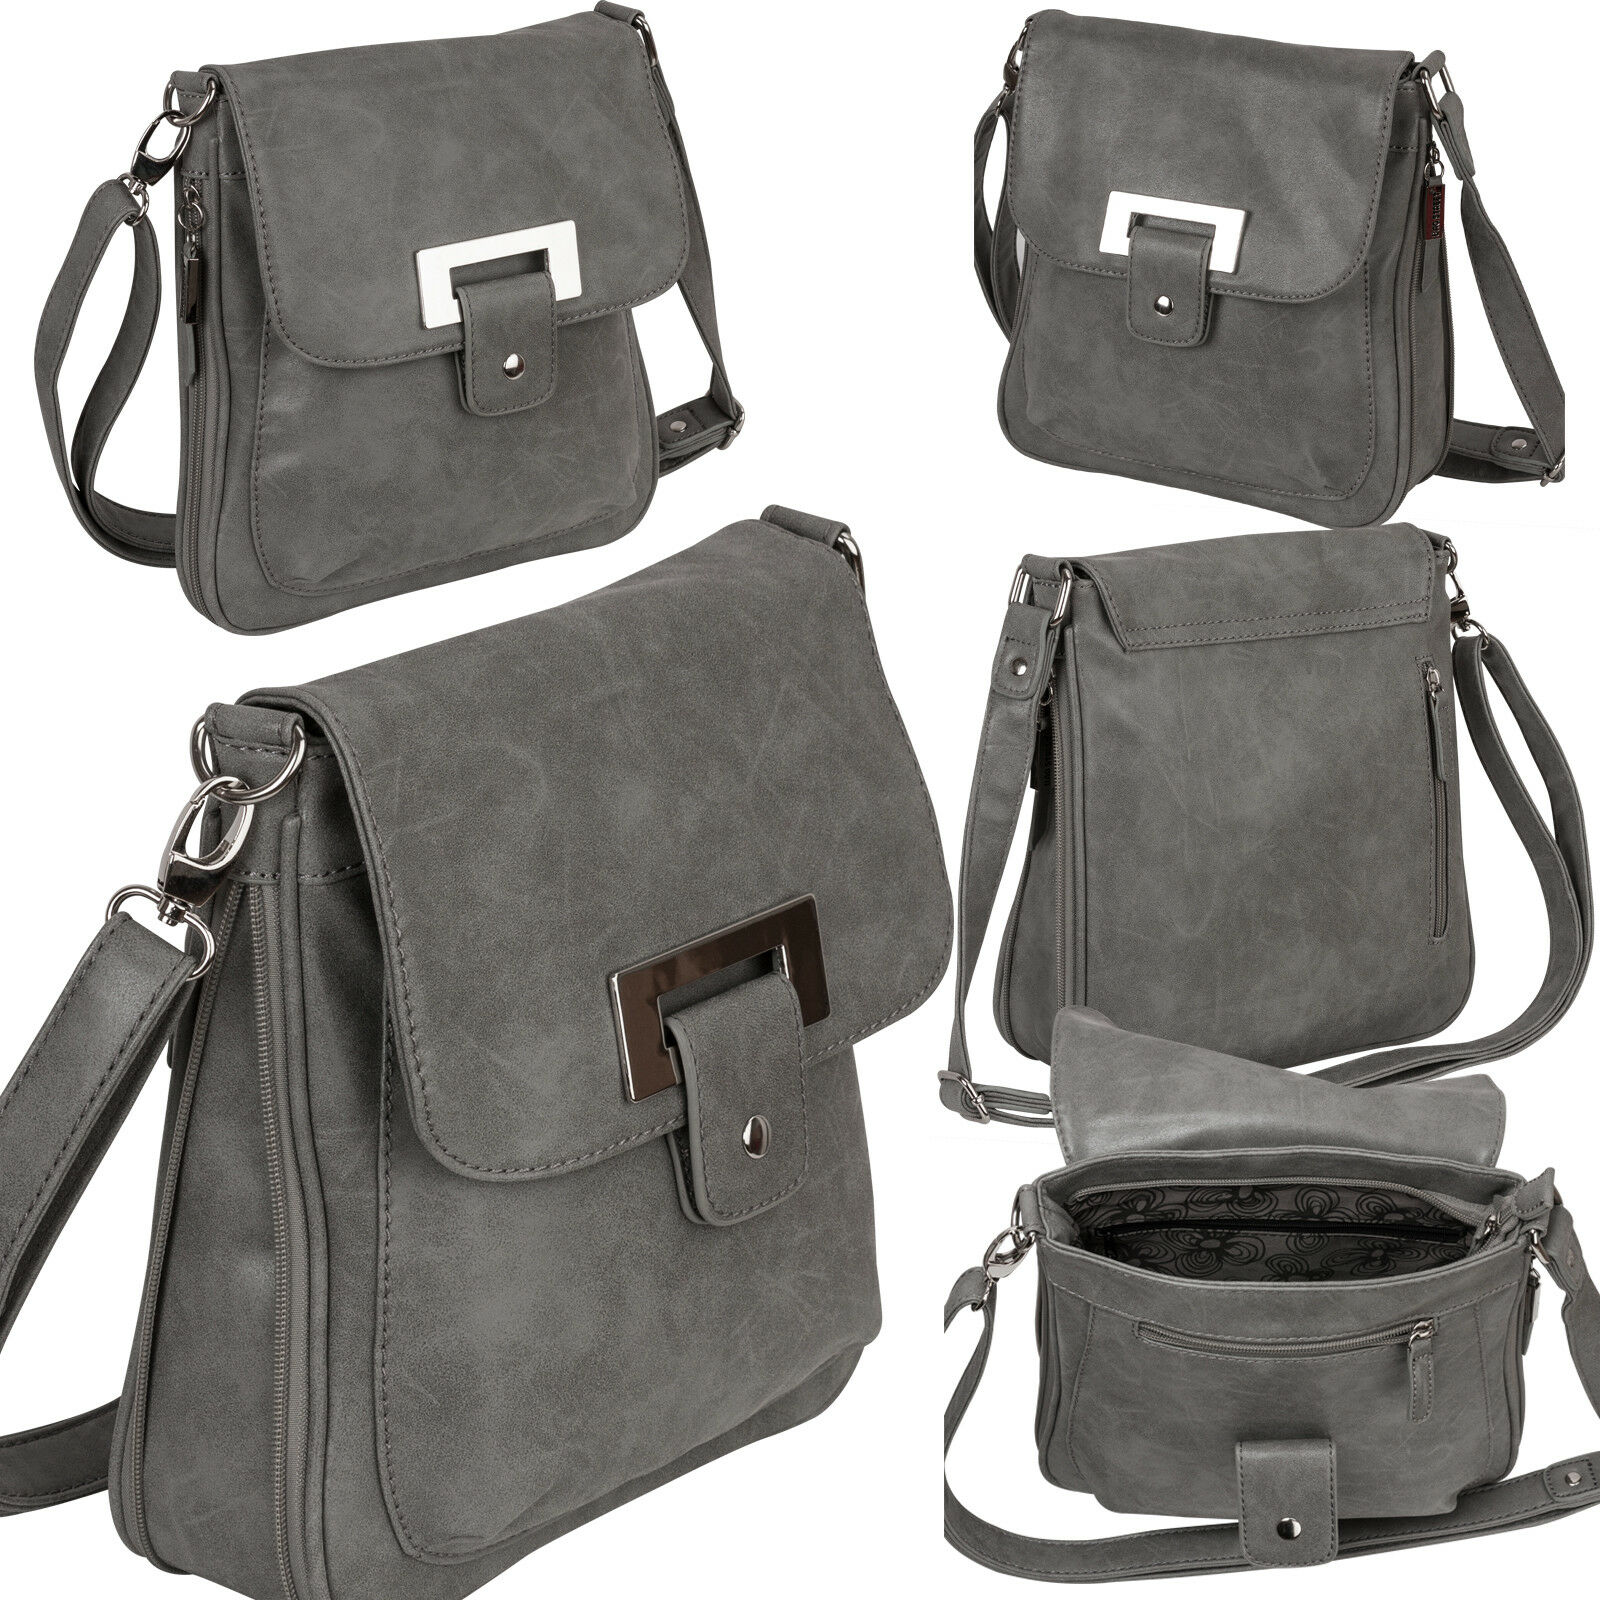 Bag Street Damentasche Umhängetasche Handtasche Schultertasche K2 T0101 Grau